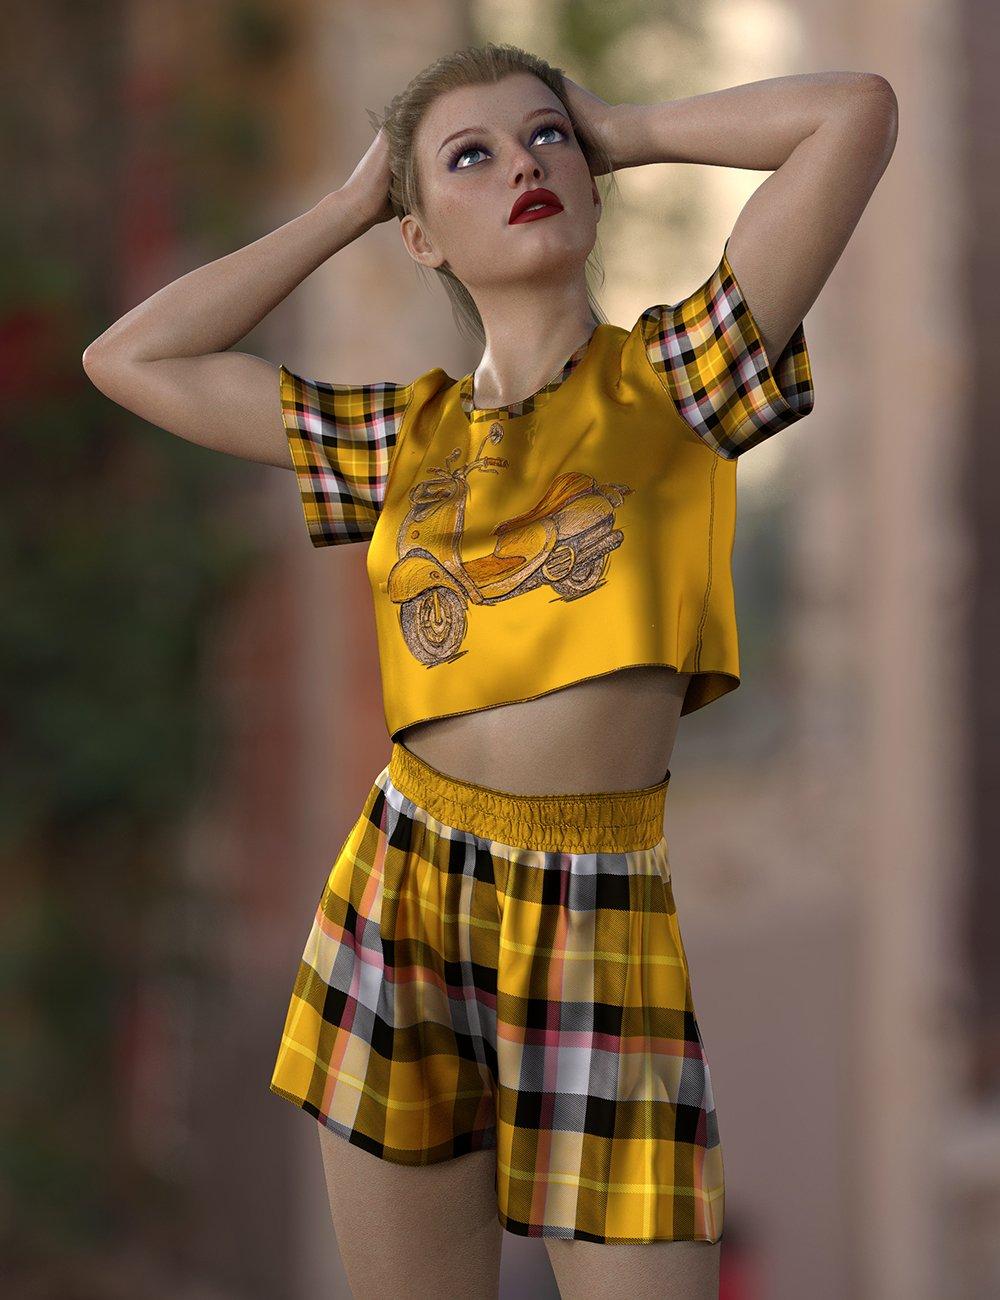 dForce Lily Outfit Texture Expansion by: Nelmi, 3D Models by Daz 3D